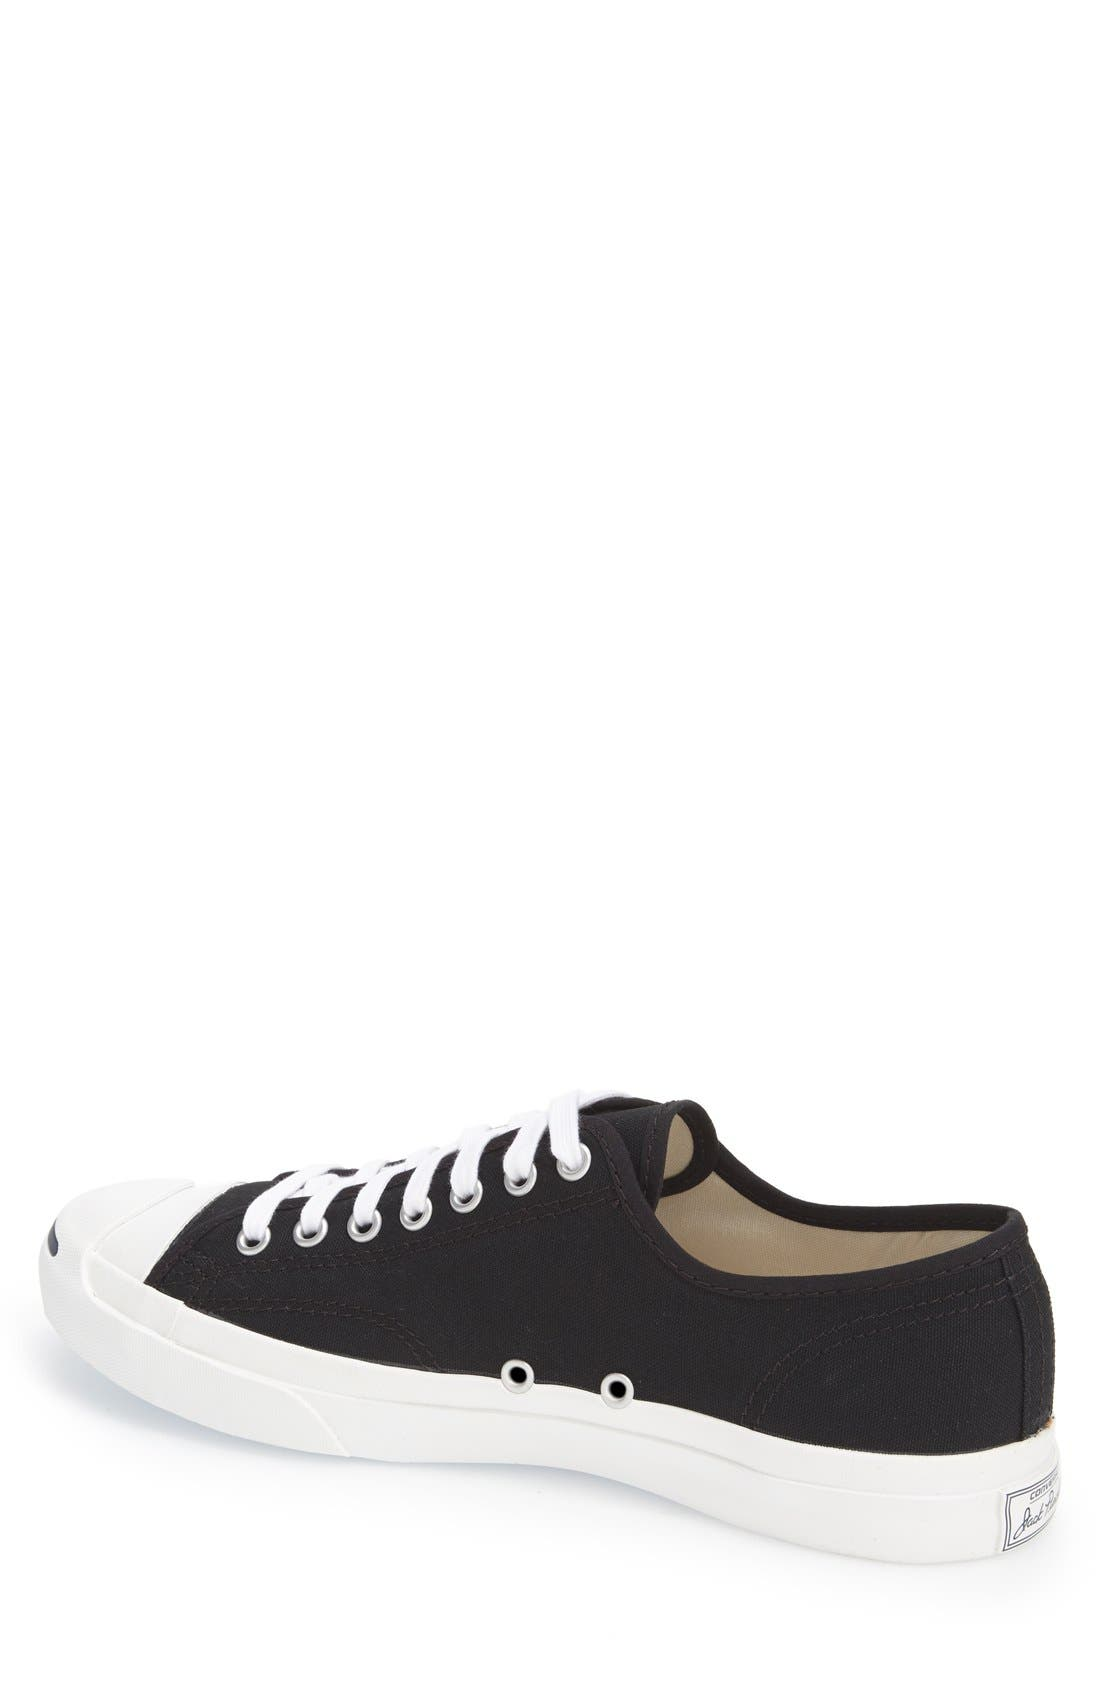 CONVERSE,                             'Jack Purcell' Sneaker,                             Alternate thumbnail 4, color,                             BLACK